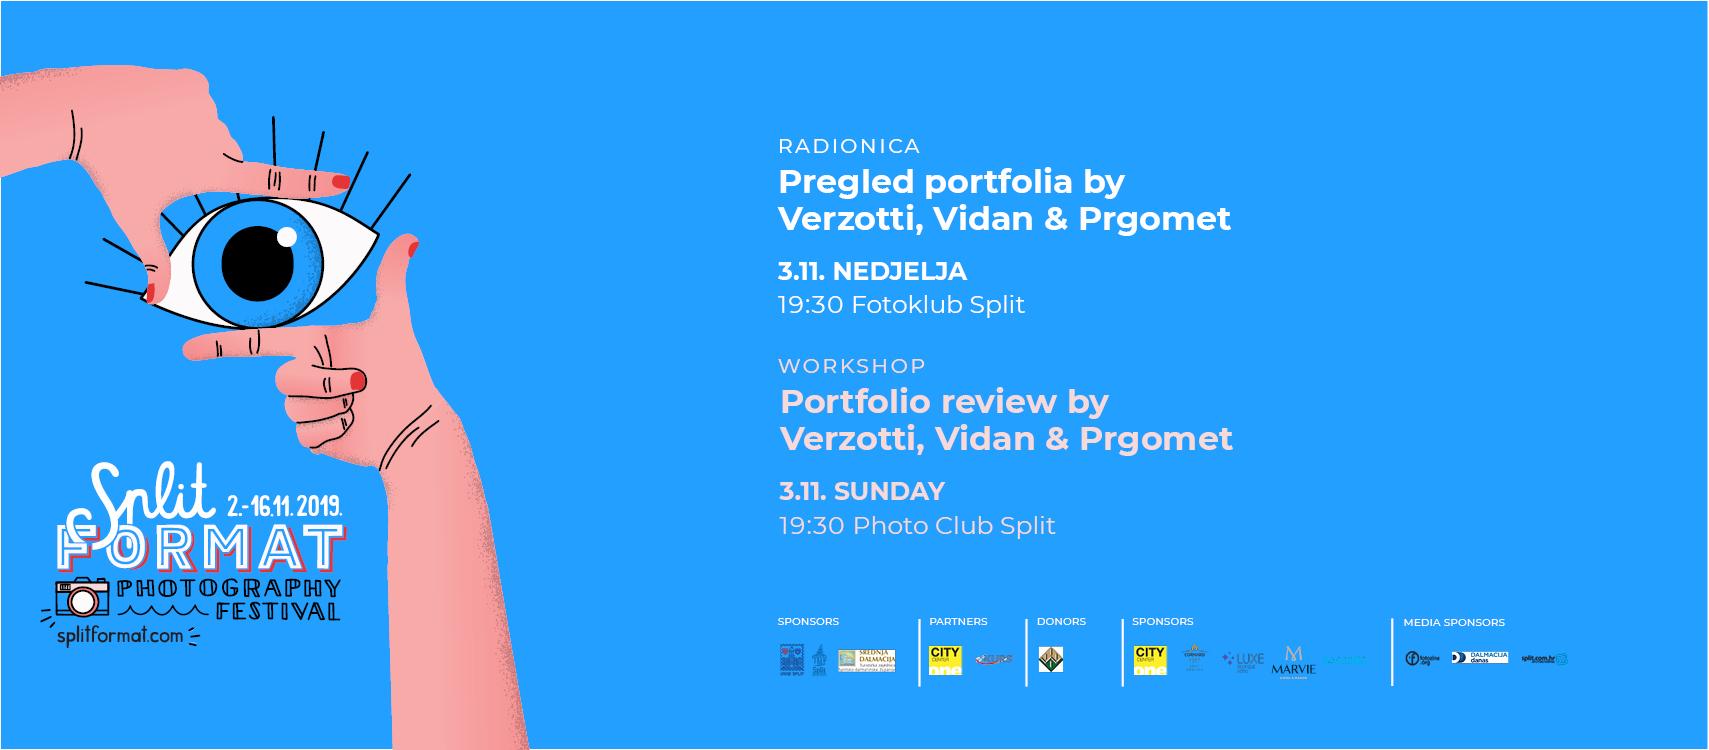 Pregled portfolija by Verzotti, Vidan i Prgomet